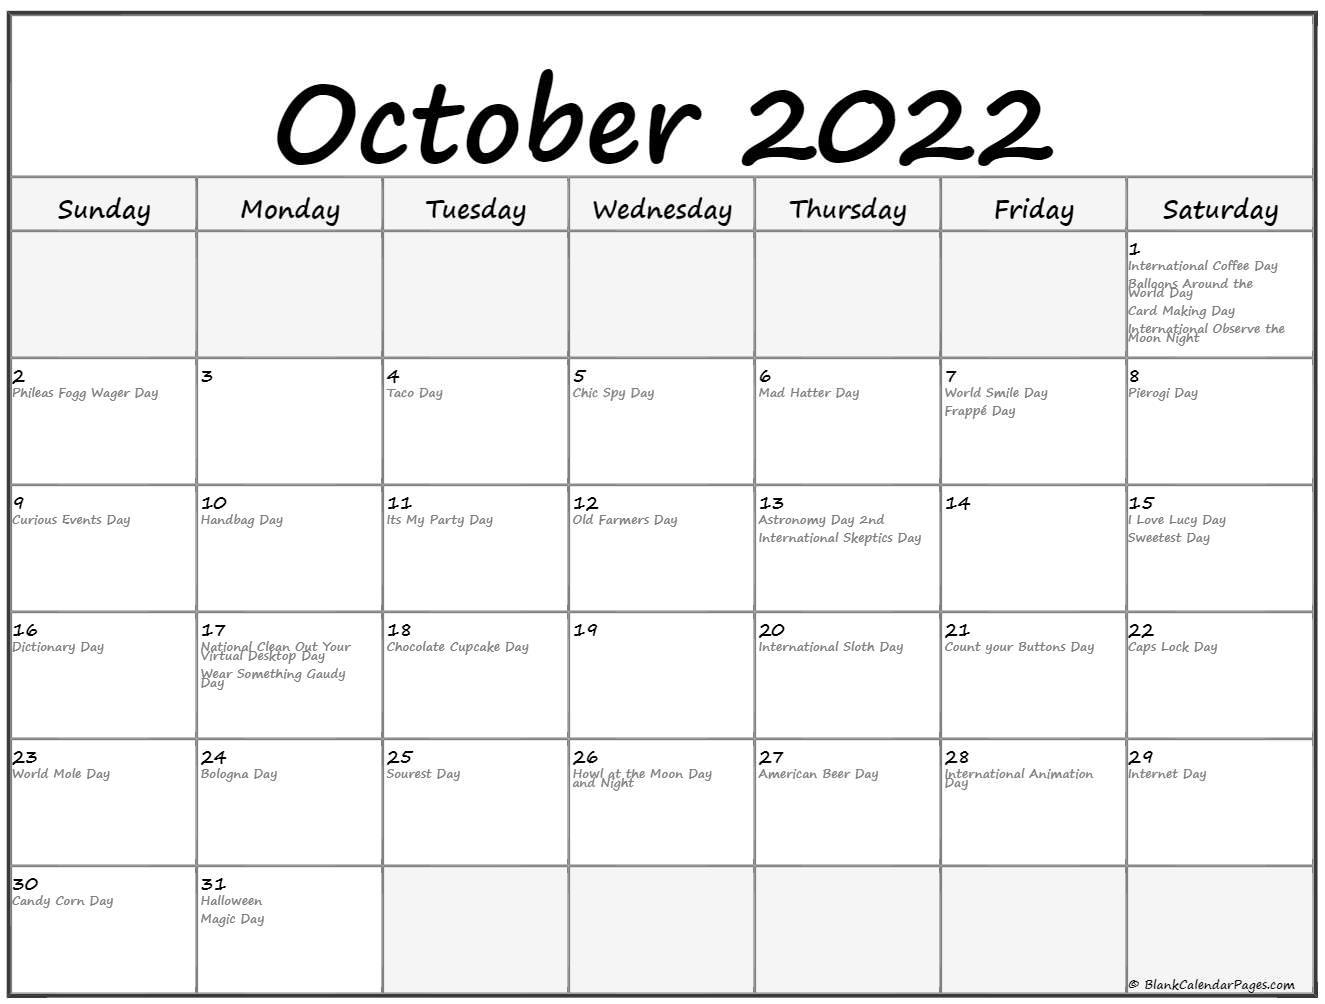 October 2022 With Holidays Calendar